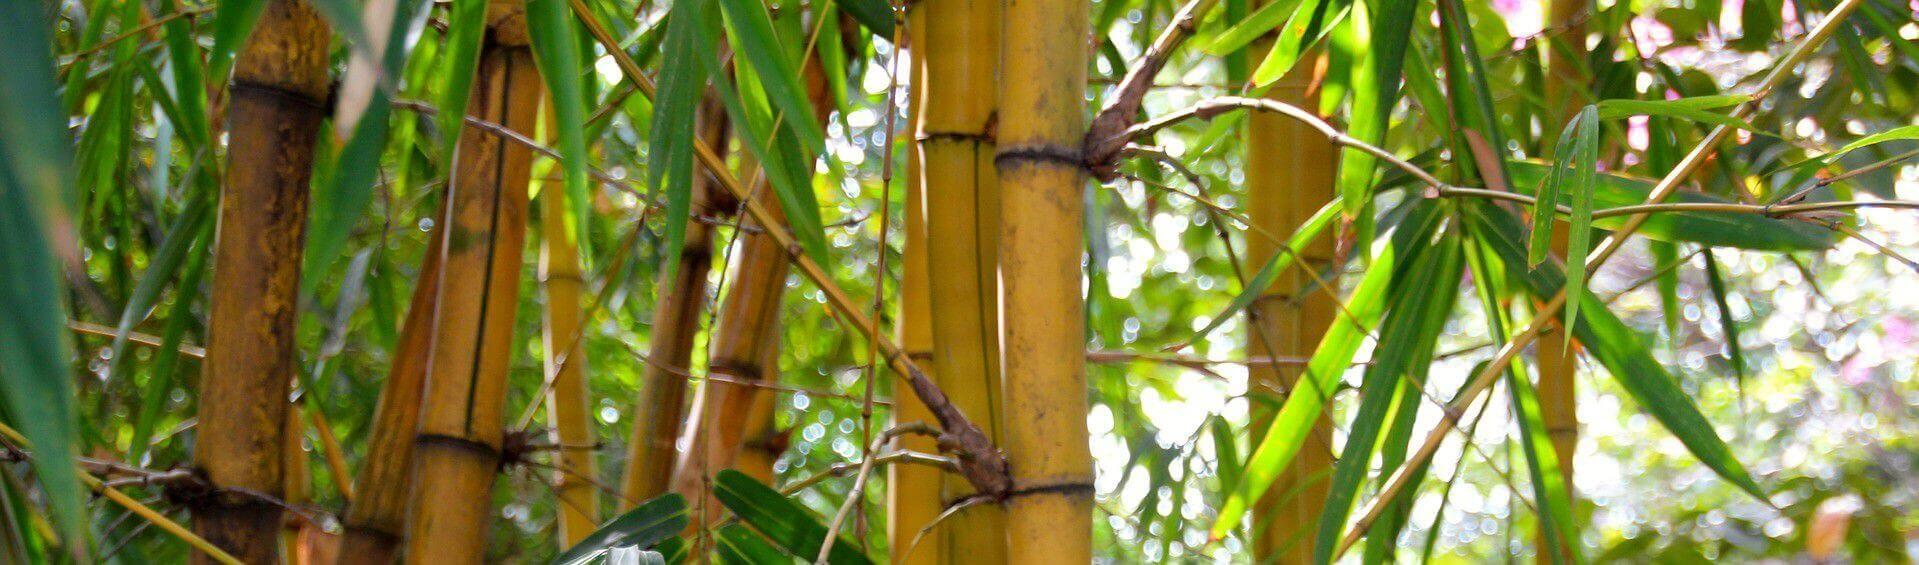 bambou pour haie